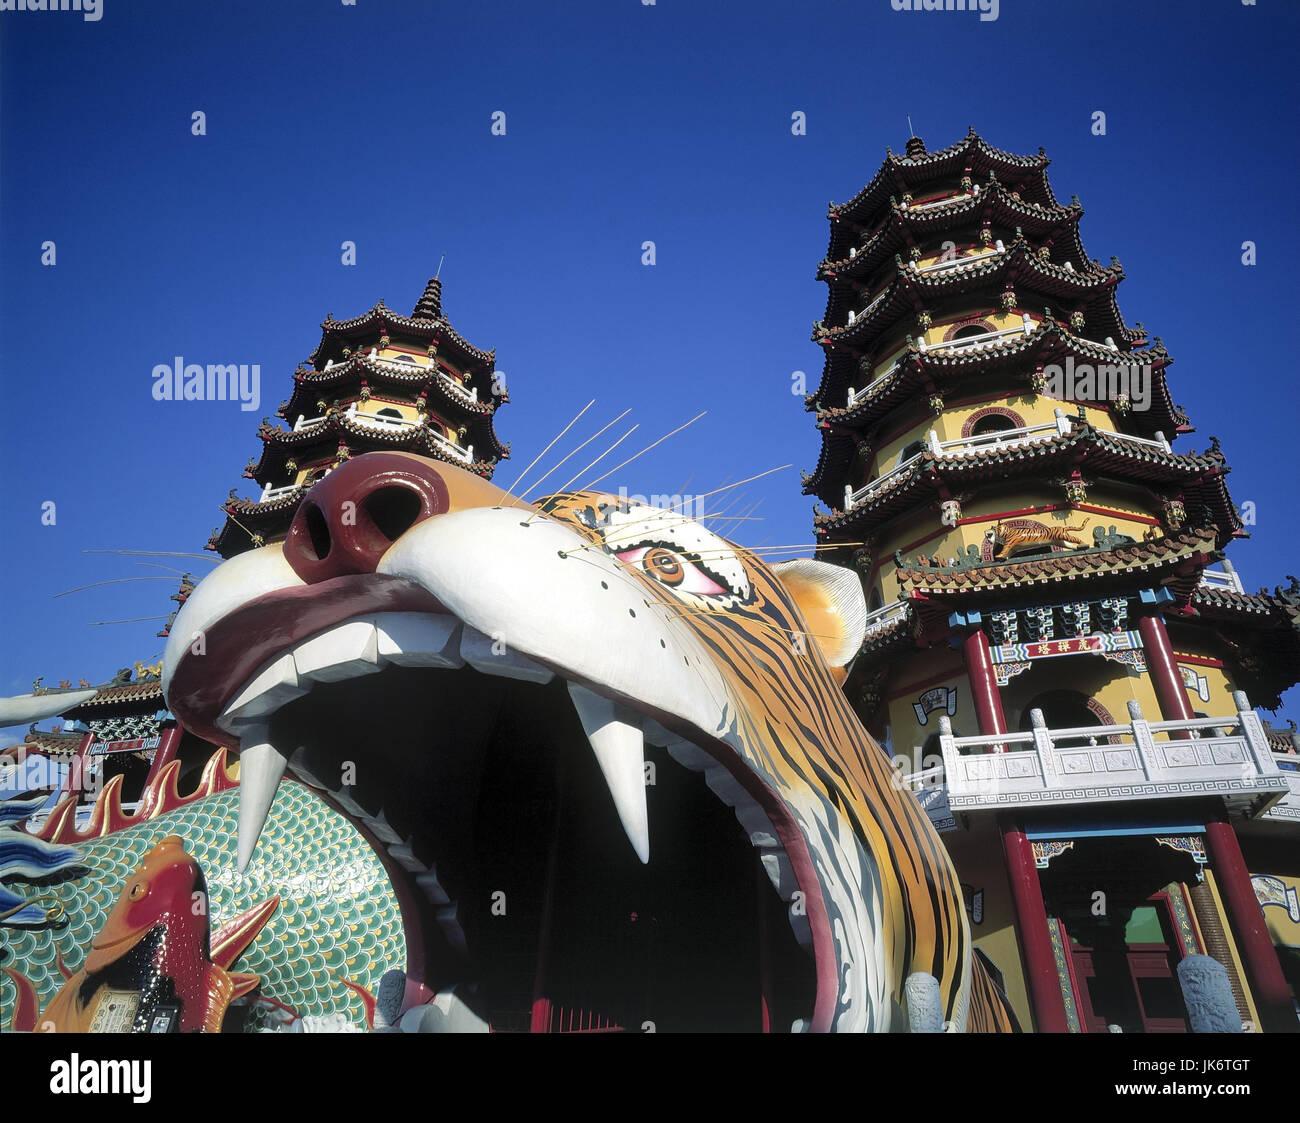 Taiwan, Kaohsiung, Lotossee, Drachen-und Tigerpagode, Detail  Asien, Ostasien, Kultur, Baukunst, Pagode, Pagoden, - Stock Image